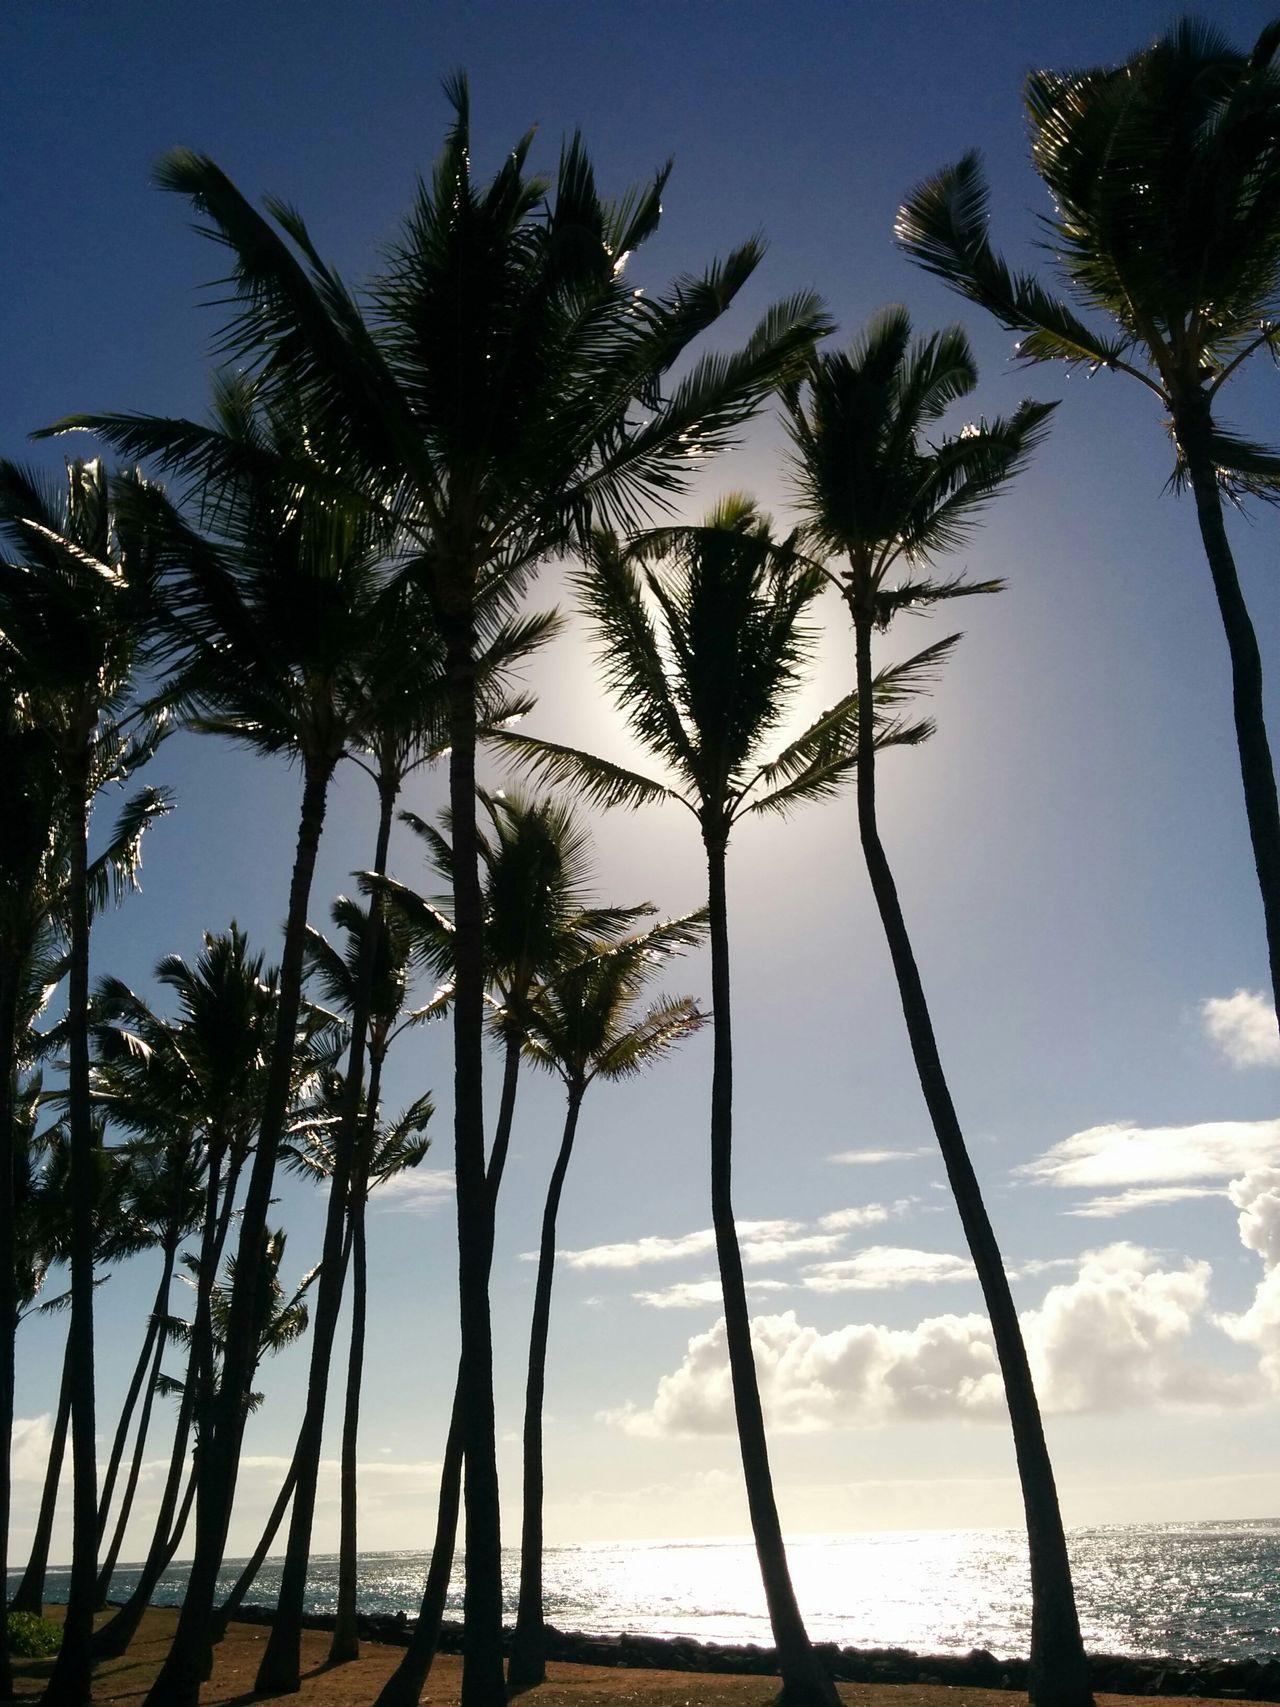 Kappa Beach Park Kauai Hawaii Palm Trees Ocean